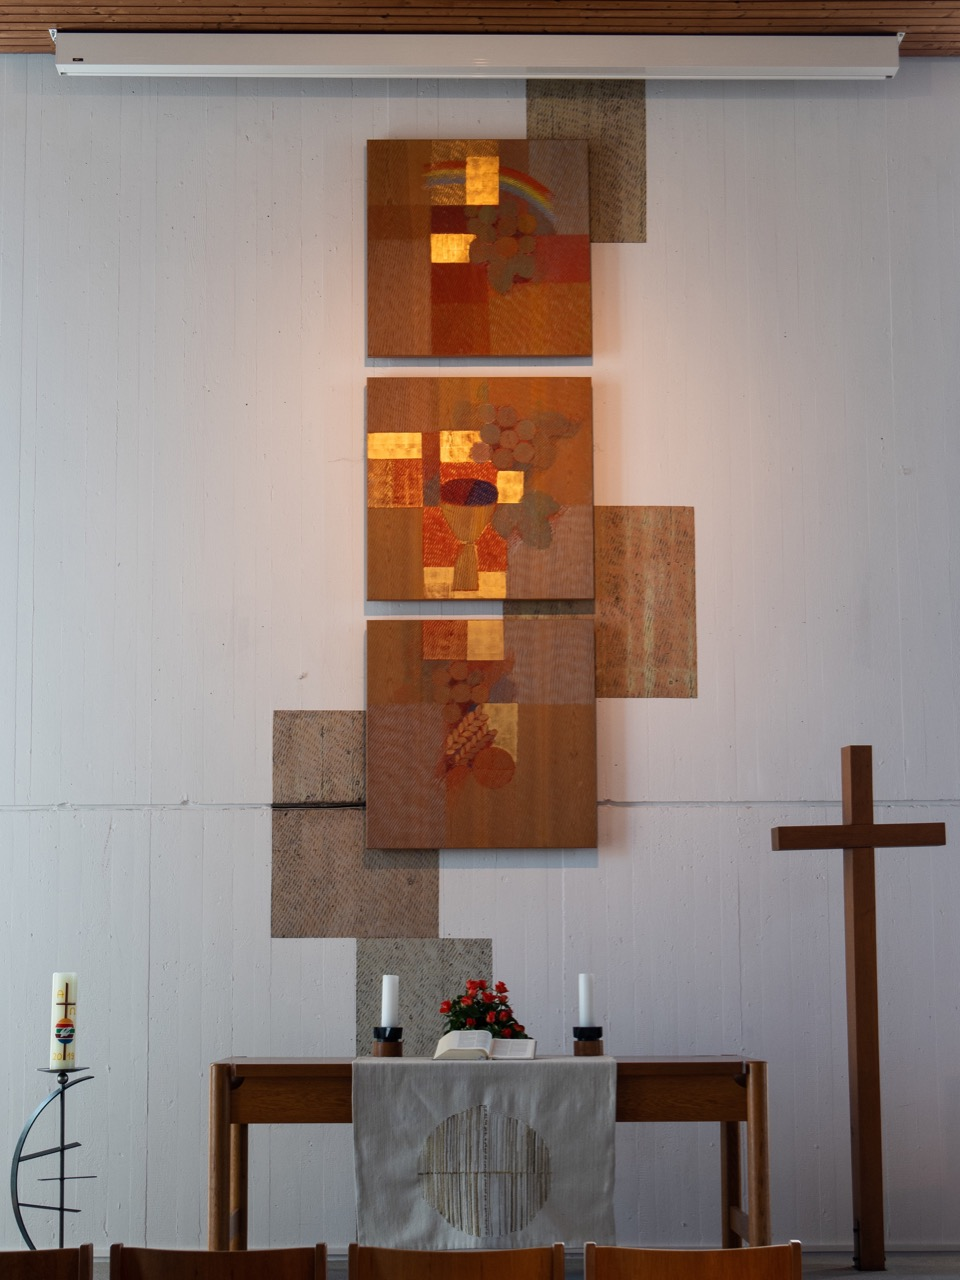 Altarbild (Emil Kiess, 1984)